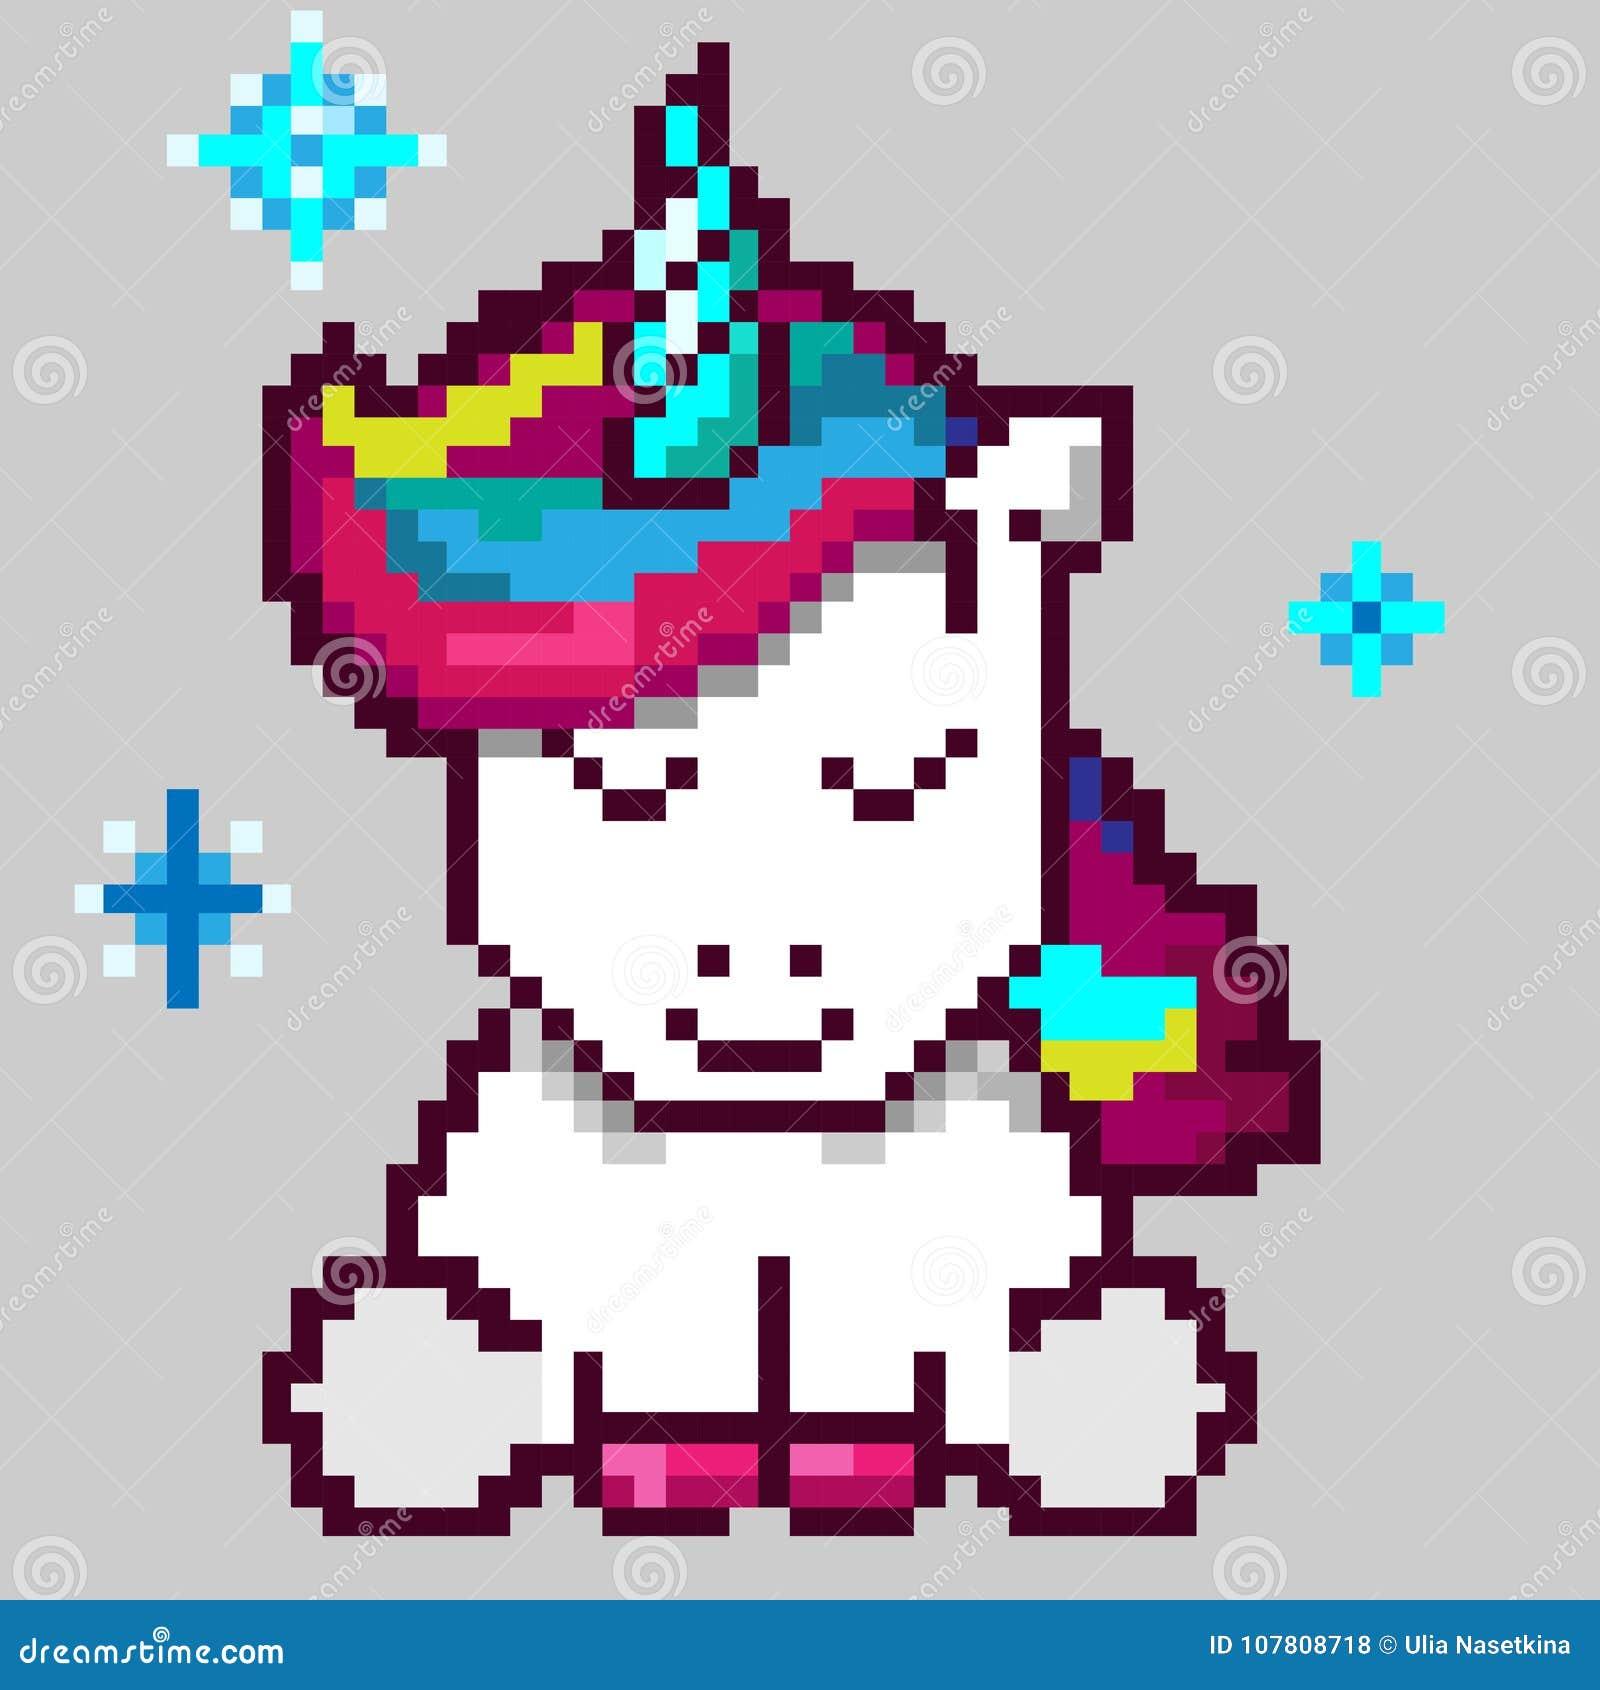 One Line Pixel Art : Cute magic unicorn pixel art editorial stock photo